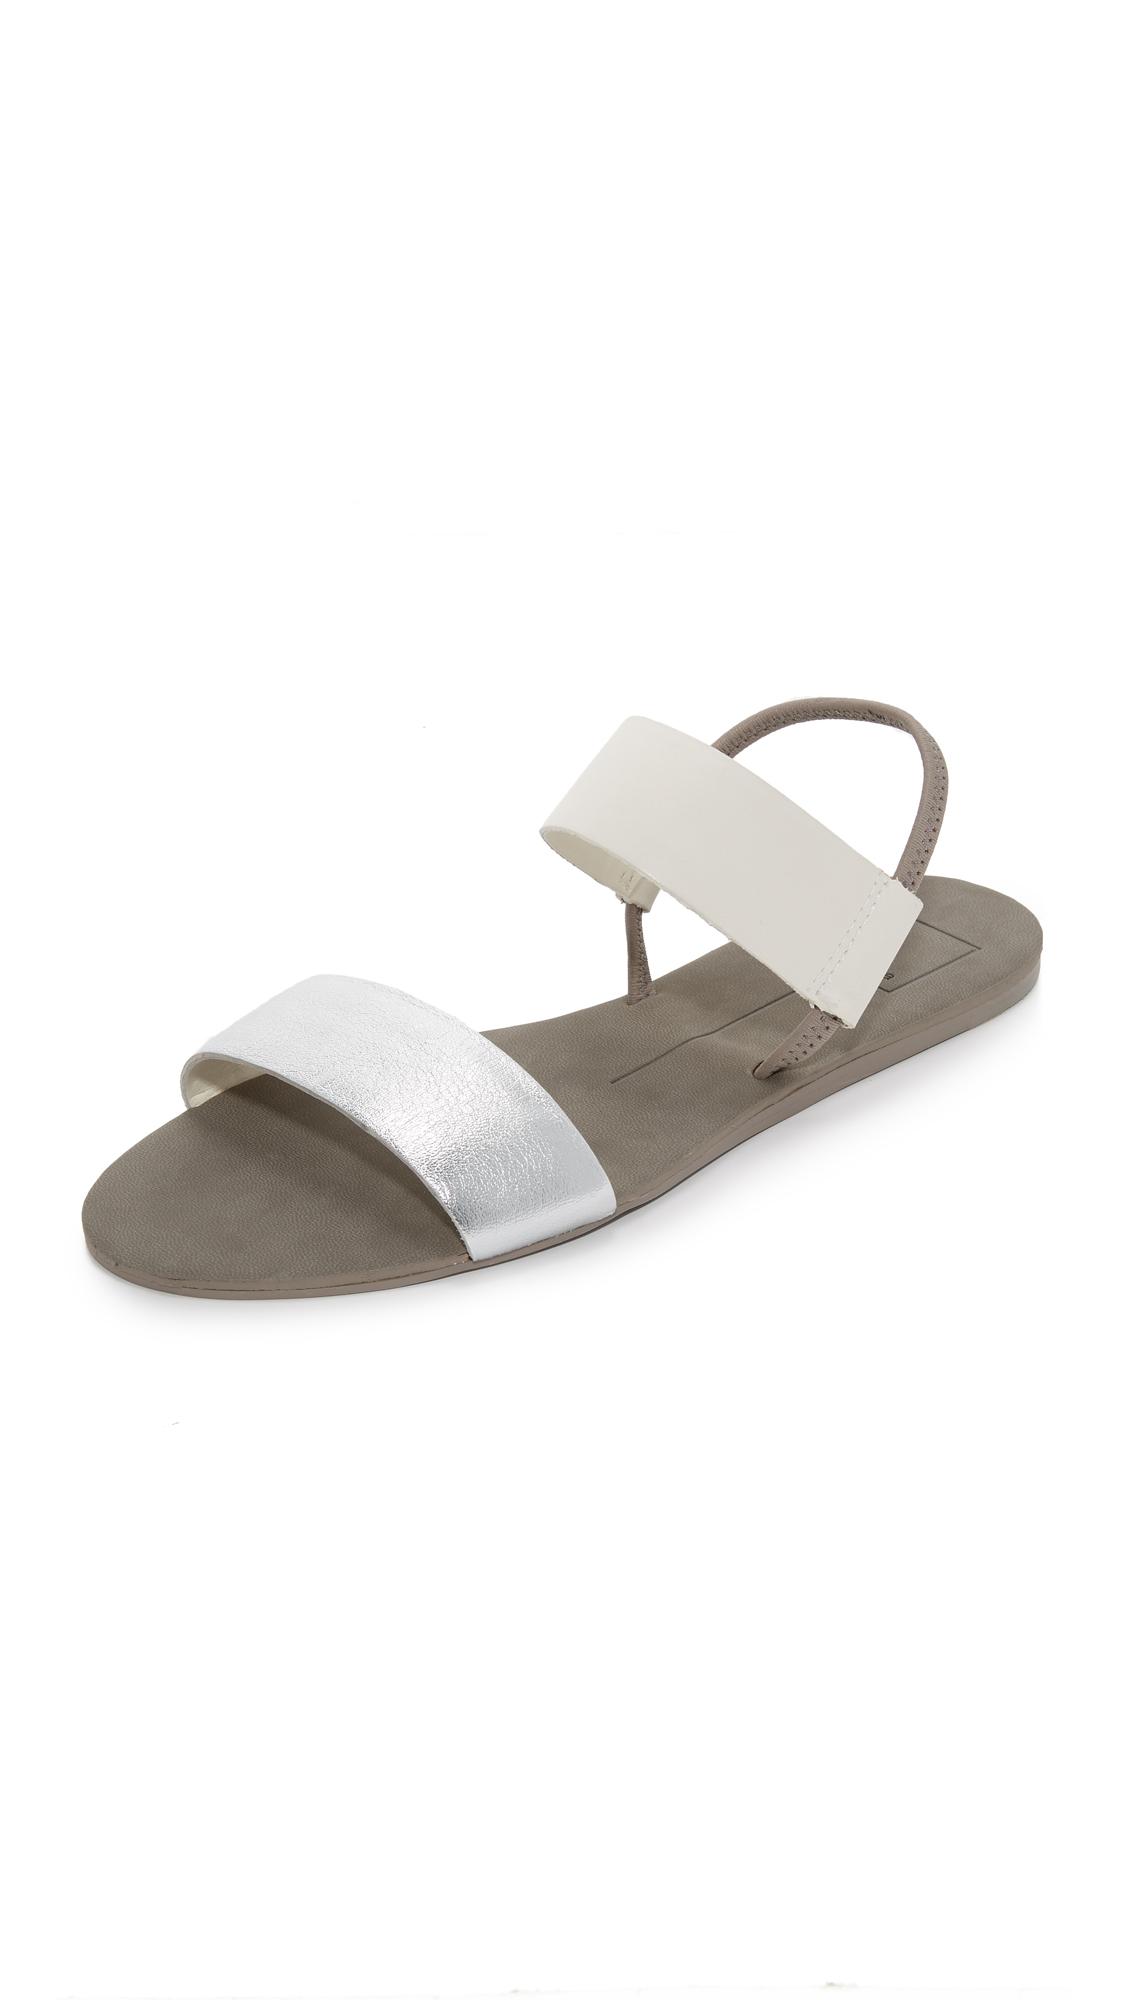 Dolce Vita Demi Elastic Sandals